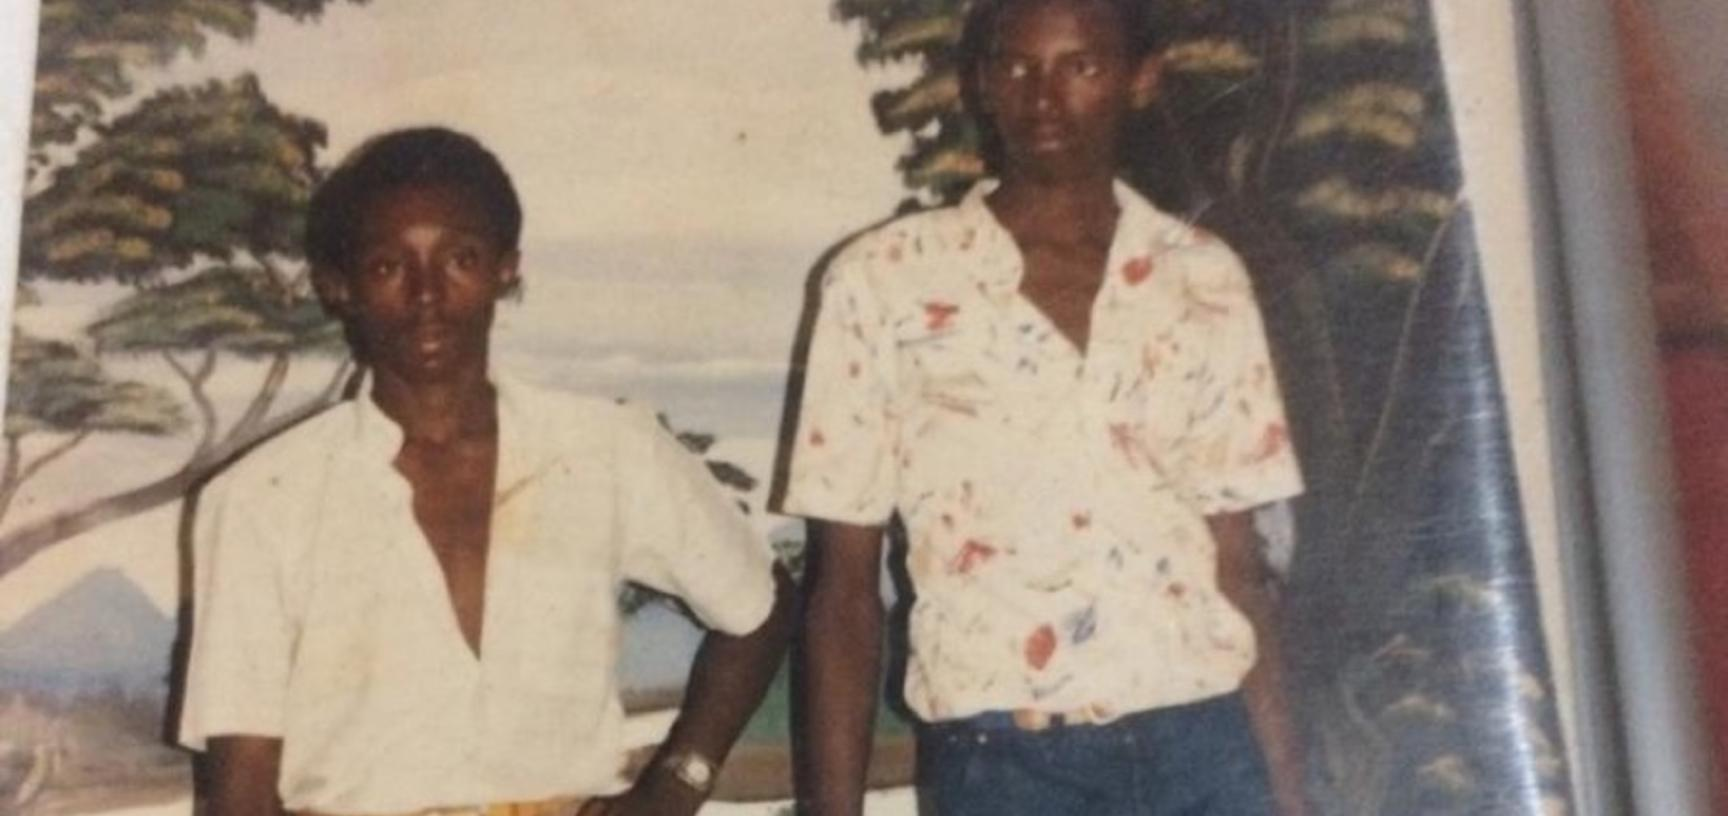 PHOTOGRAPH. Victims: Joseph Gatare and Bashire Pierre Niyoyita (brothers). Location: Kibungo, Birenga, Rwanda. Lender: Webare (nickname).